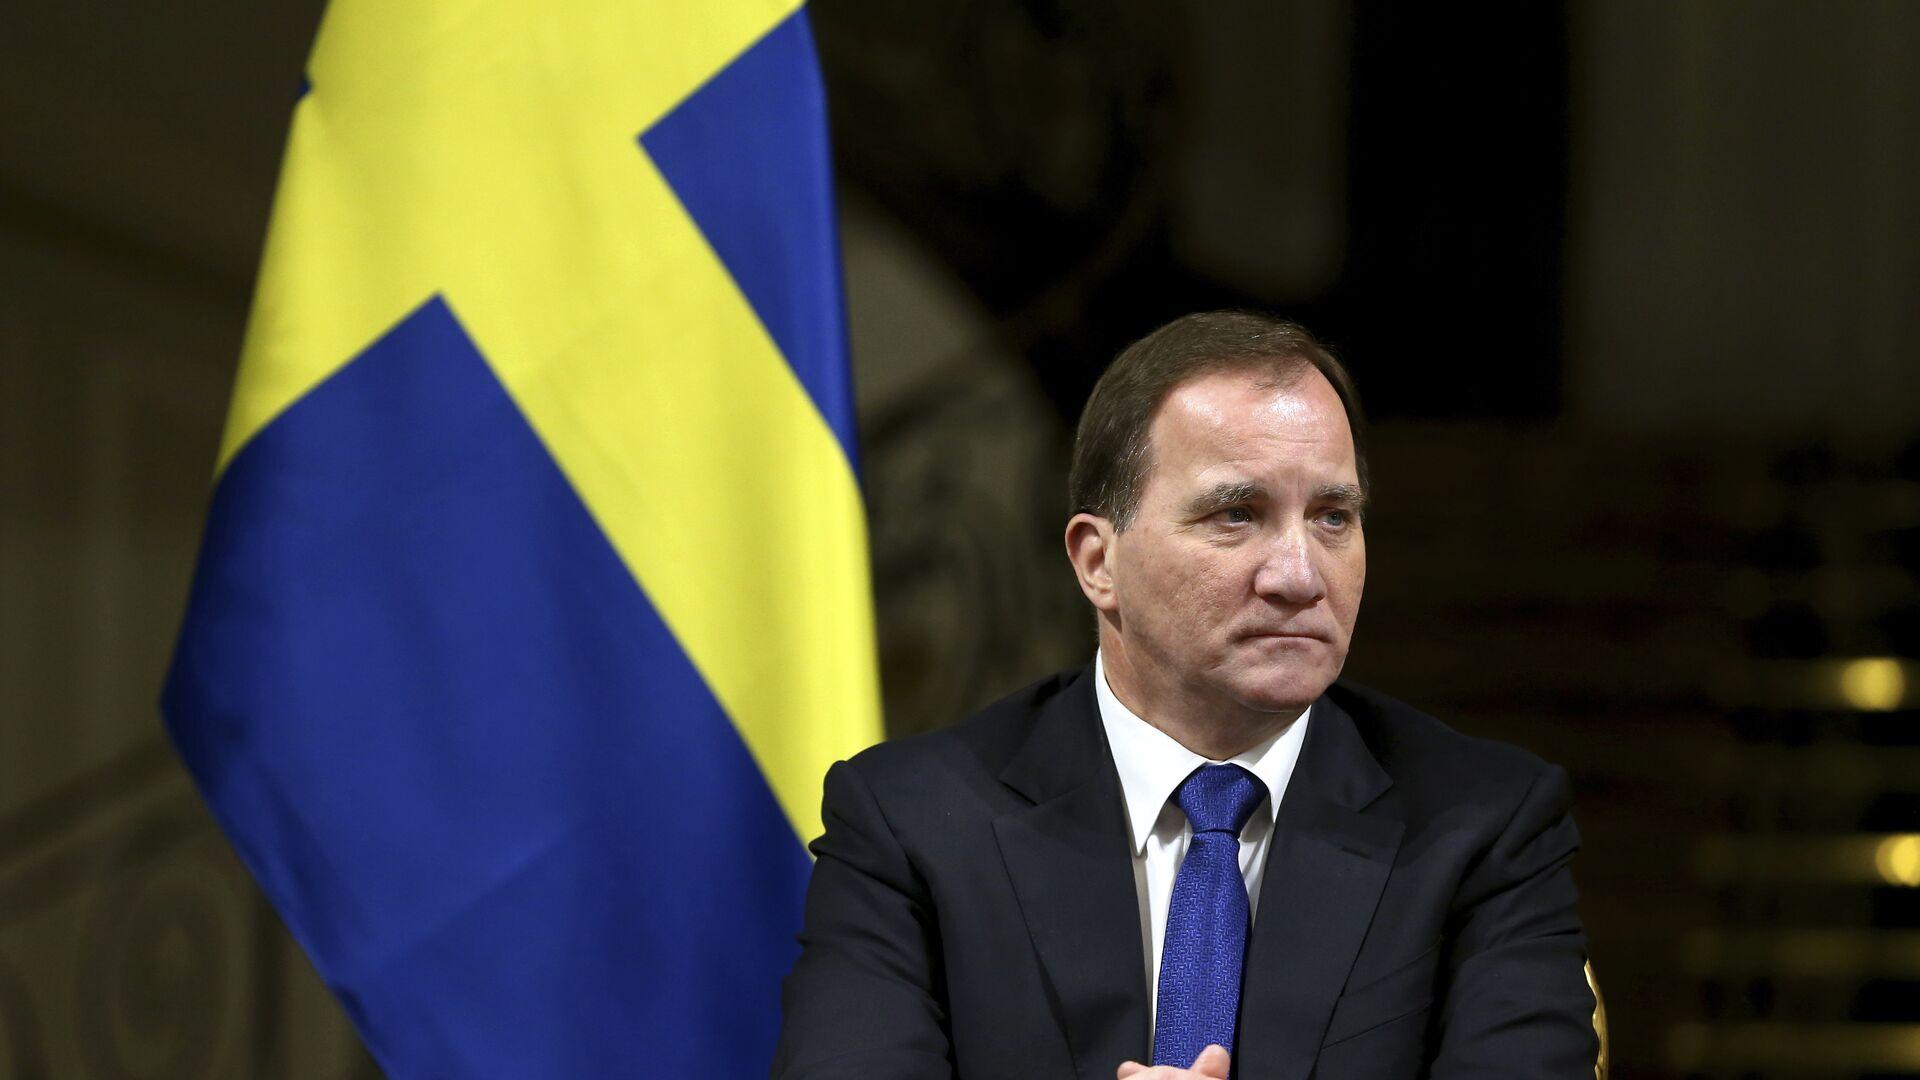 Primo ministro svedese Stefan Lofven  - Sputnik Italia, 1920, 27.04.2021